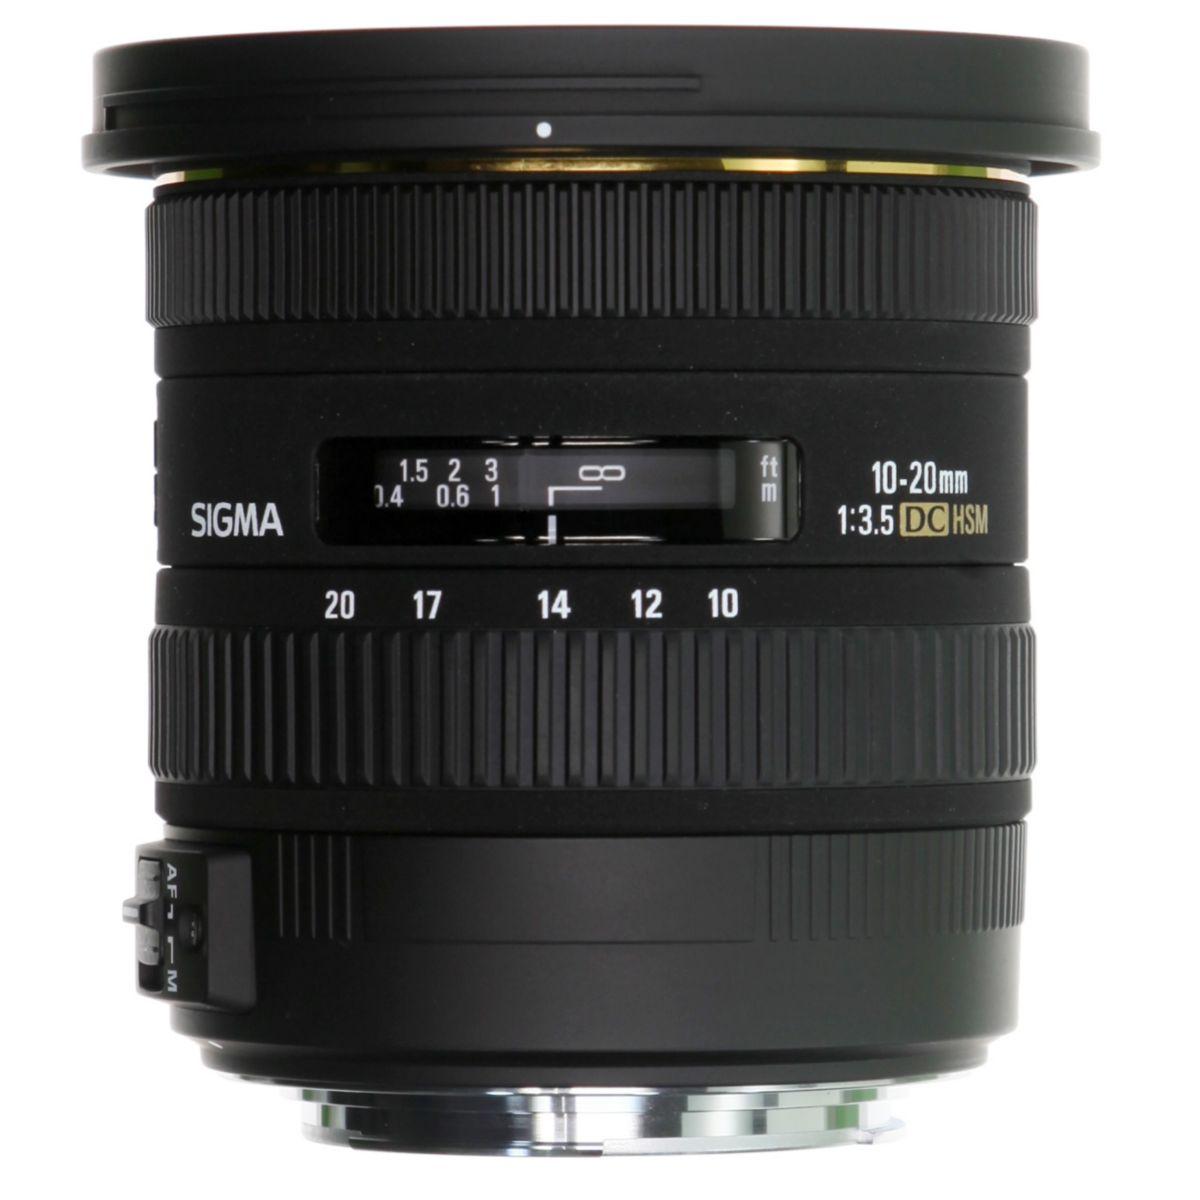 Objectif SIGMA 10-20mm f/3.5 EX DC HSM Sony